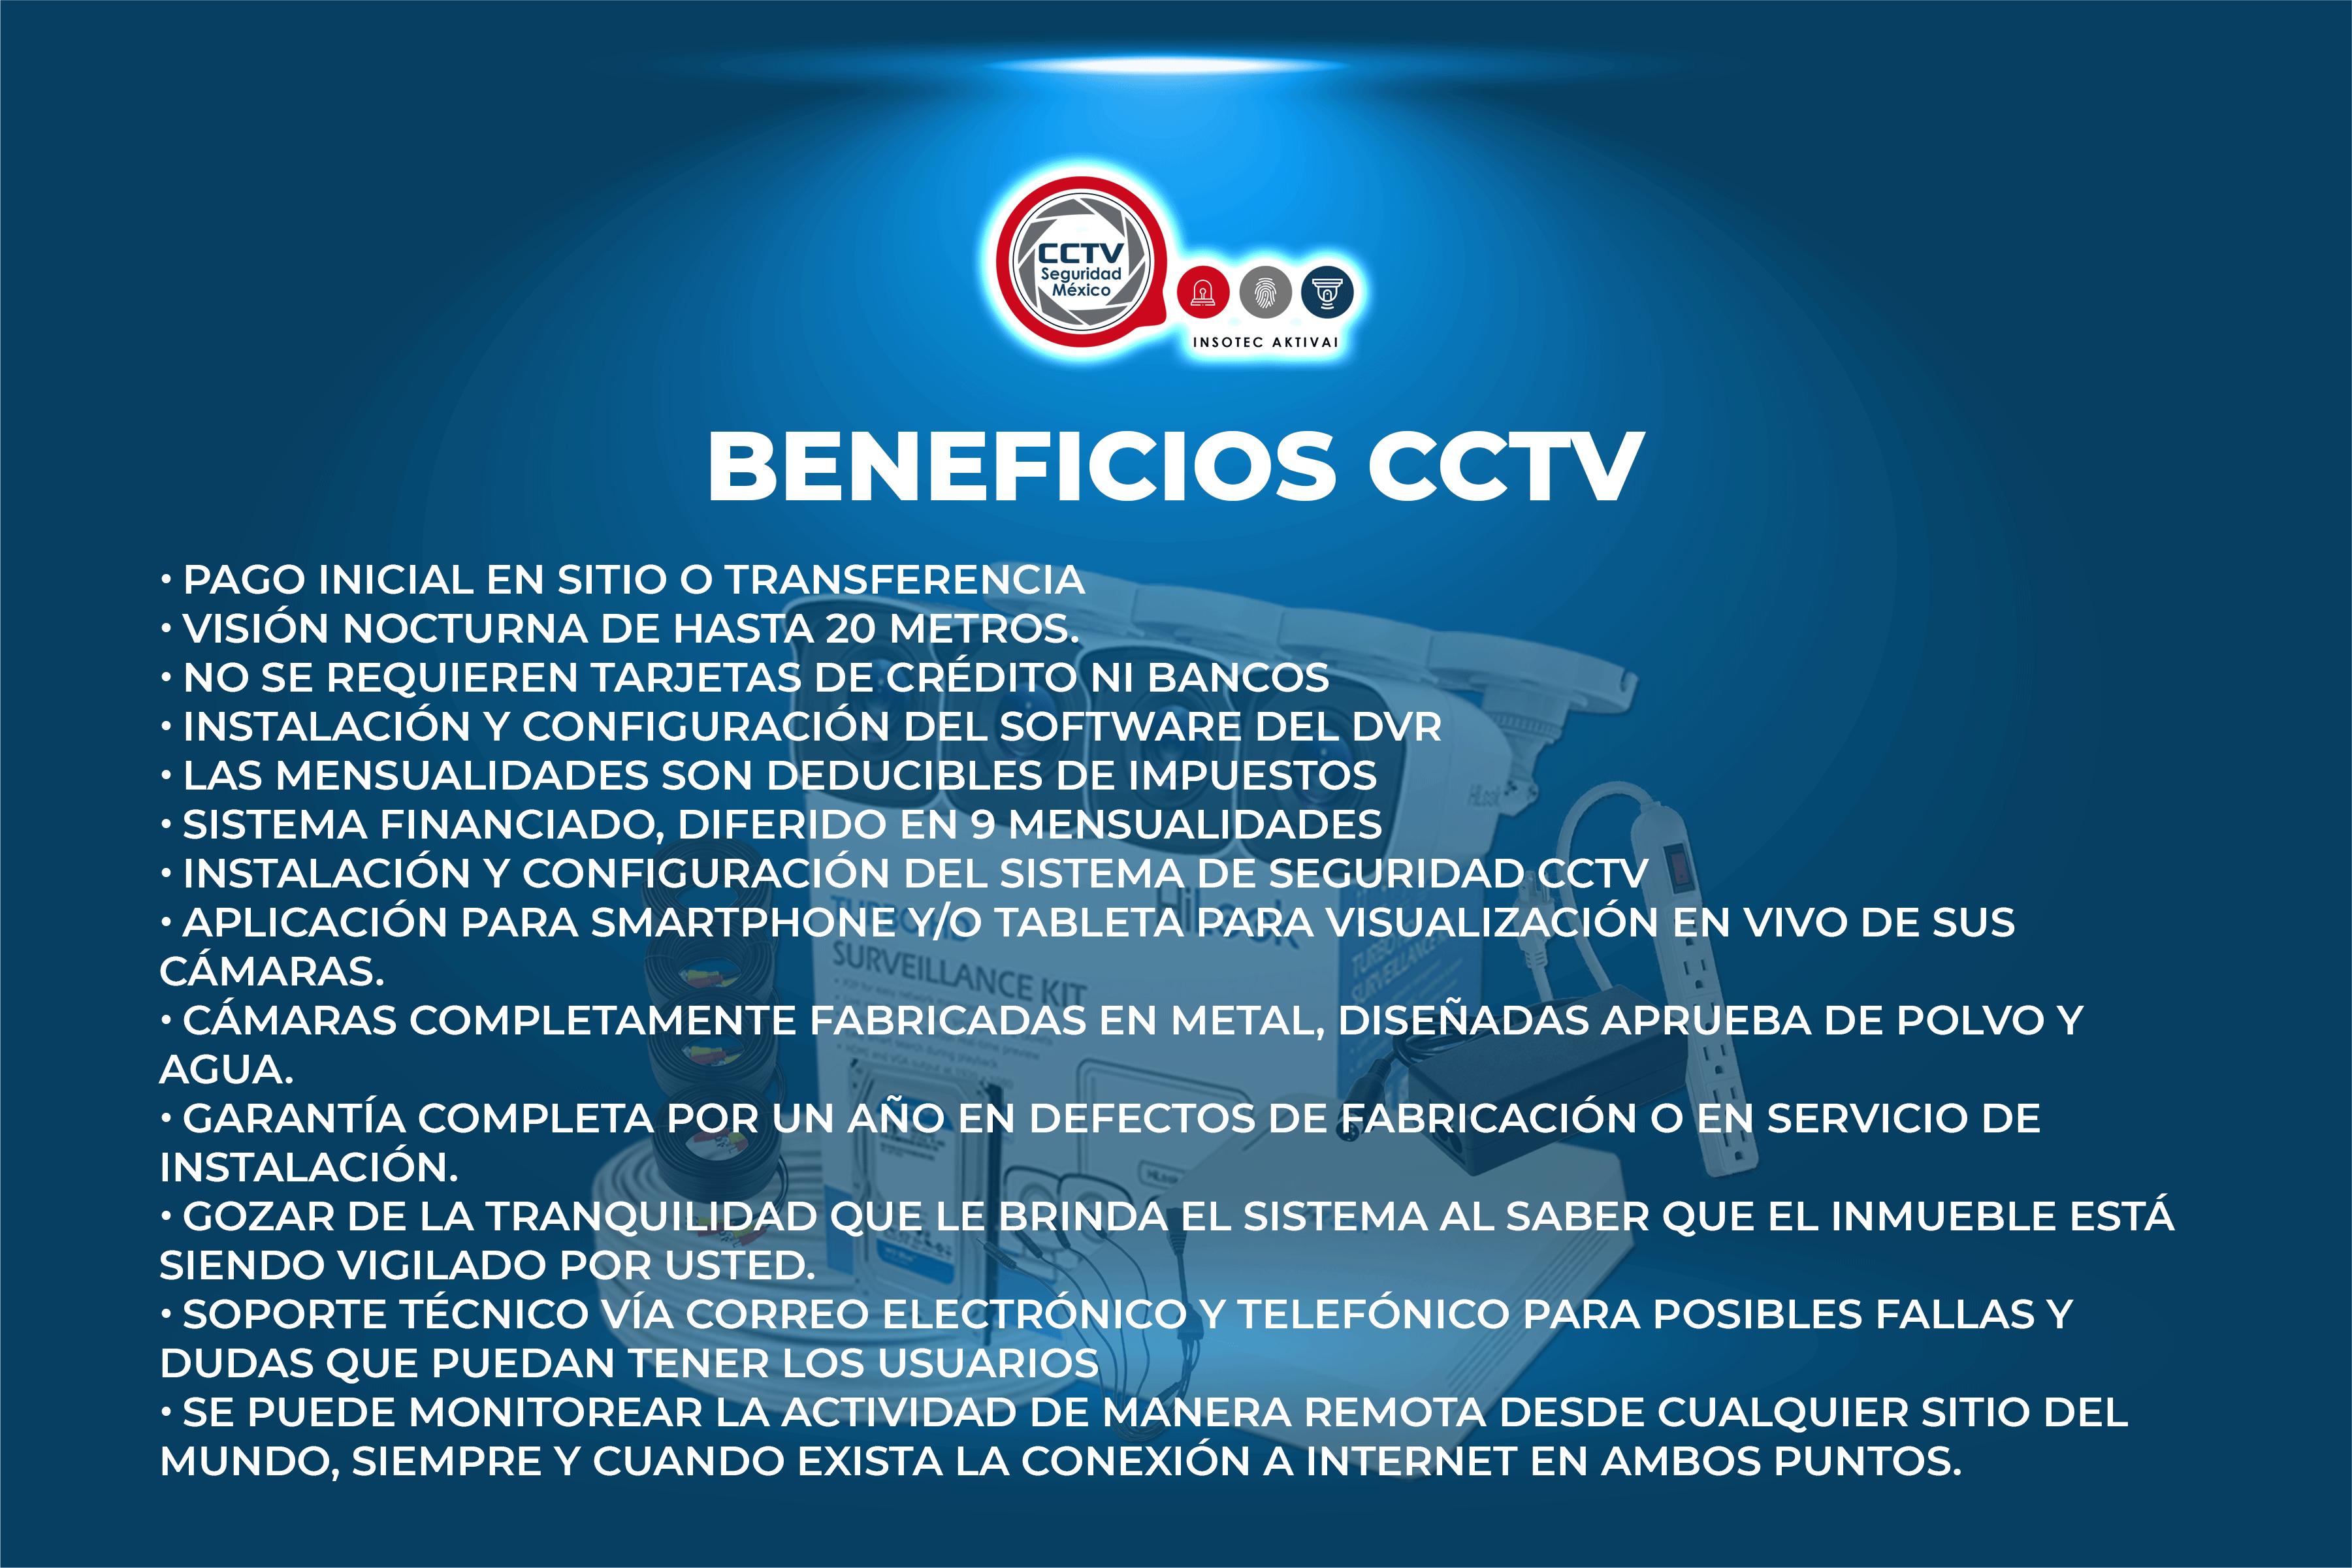 BENEFICIOS-CCTV-FINANCIADO